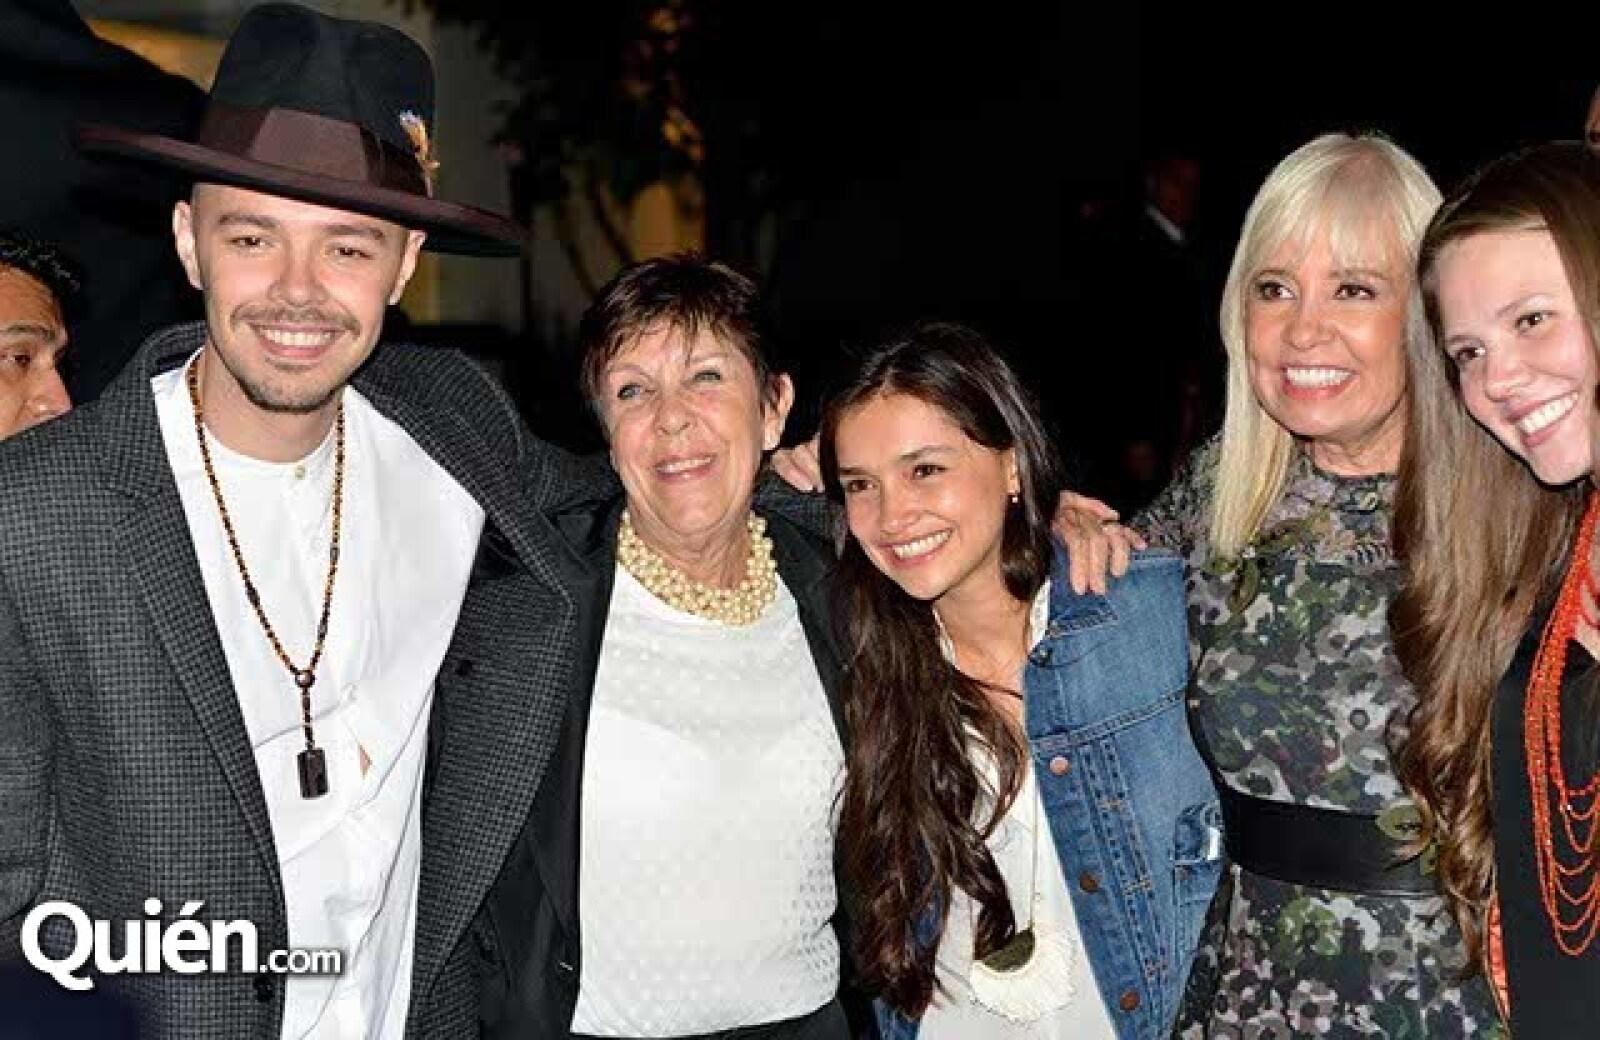 Jesse,Conchis Tavera,Mónica Huerta,Carla Estrada y Joy.